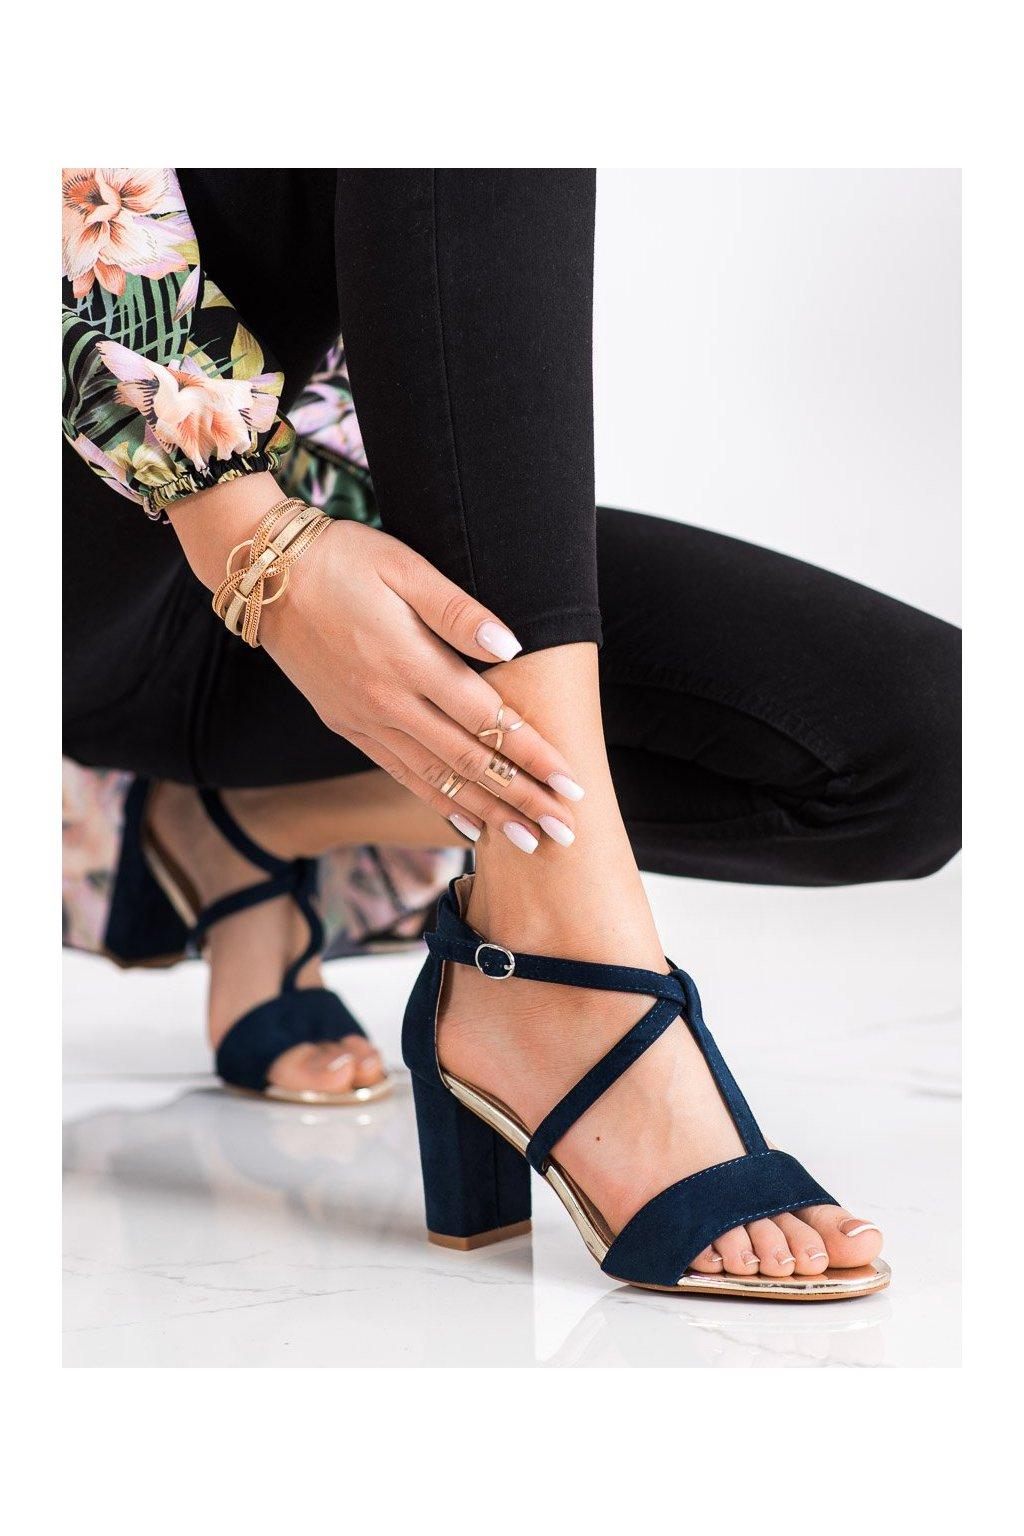 Modré sandále na podpätku Vinceza kod YQE21-17098N